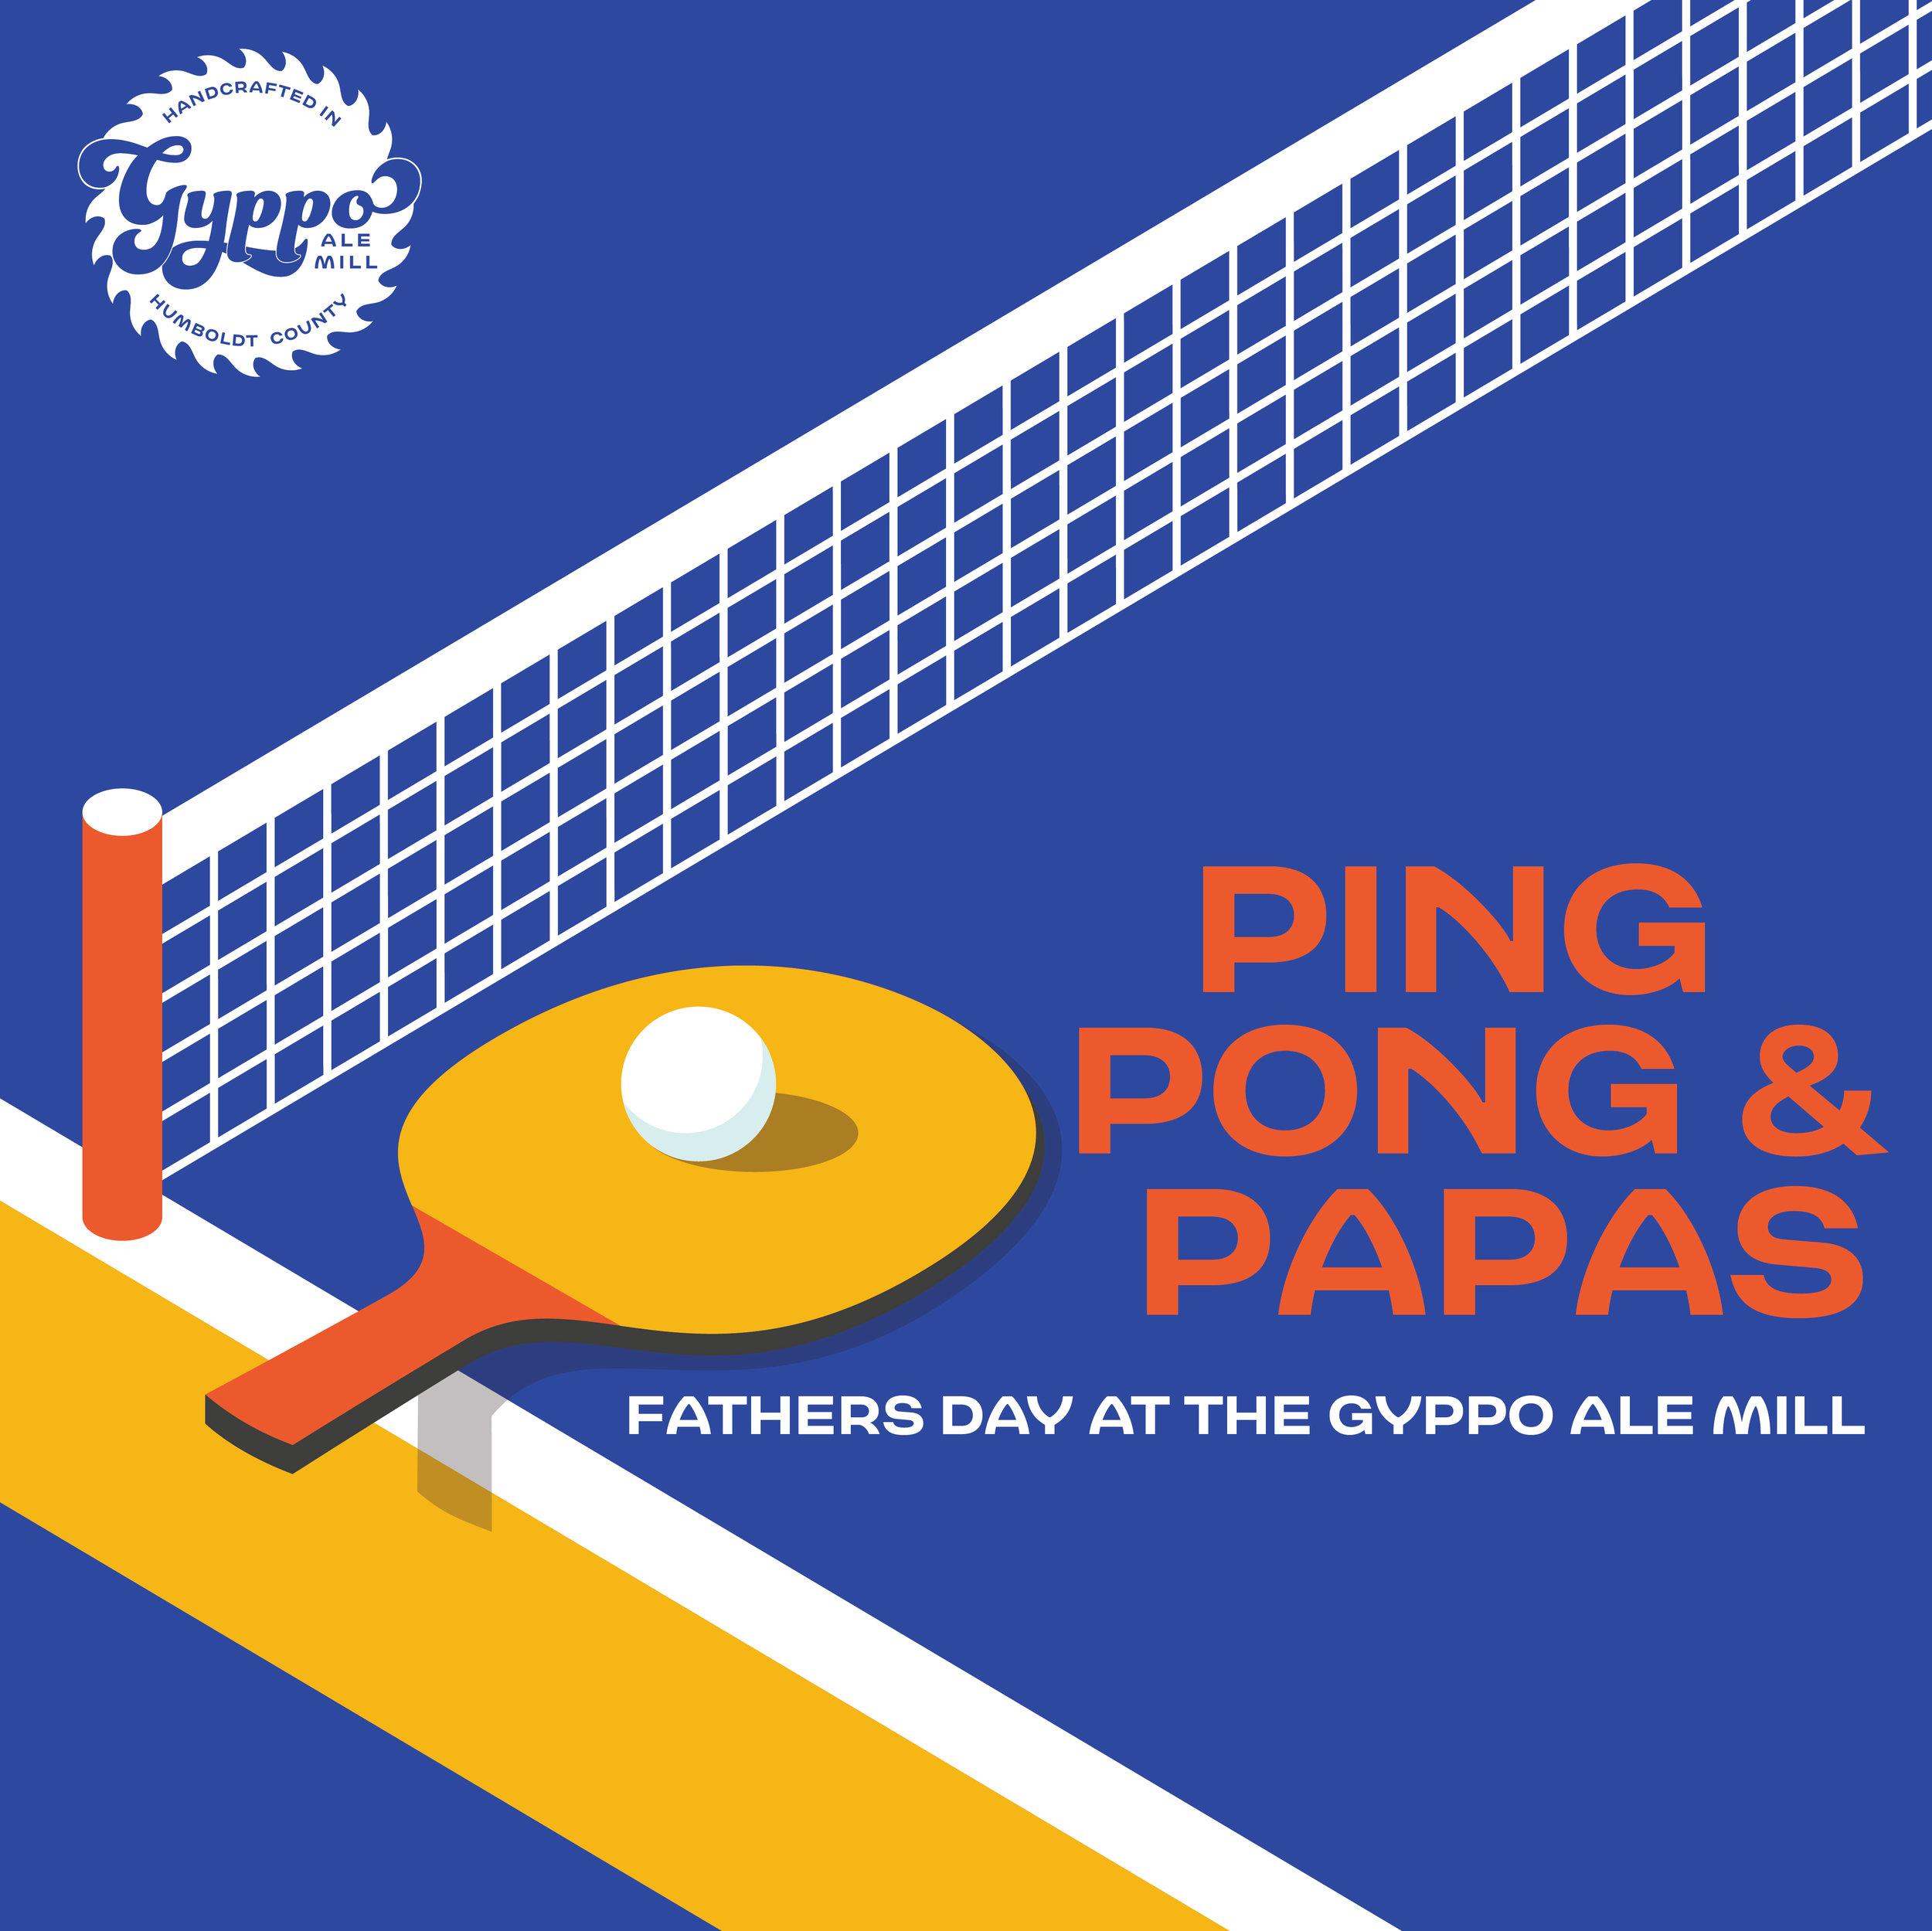 ping-pong-papas-2019